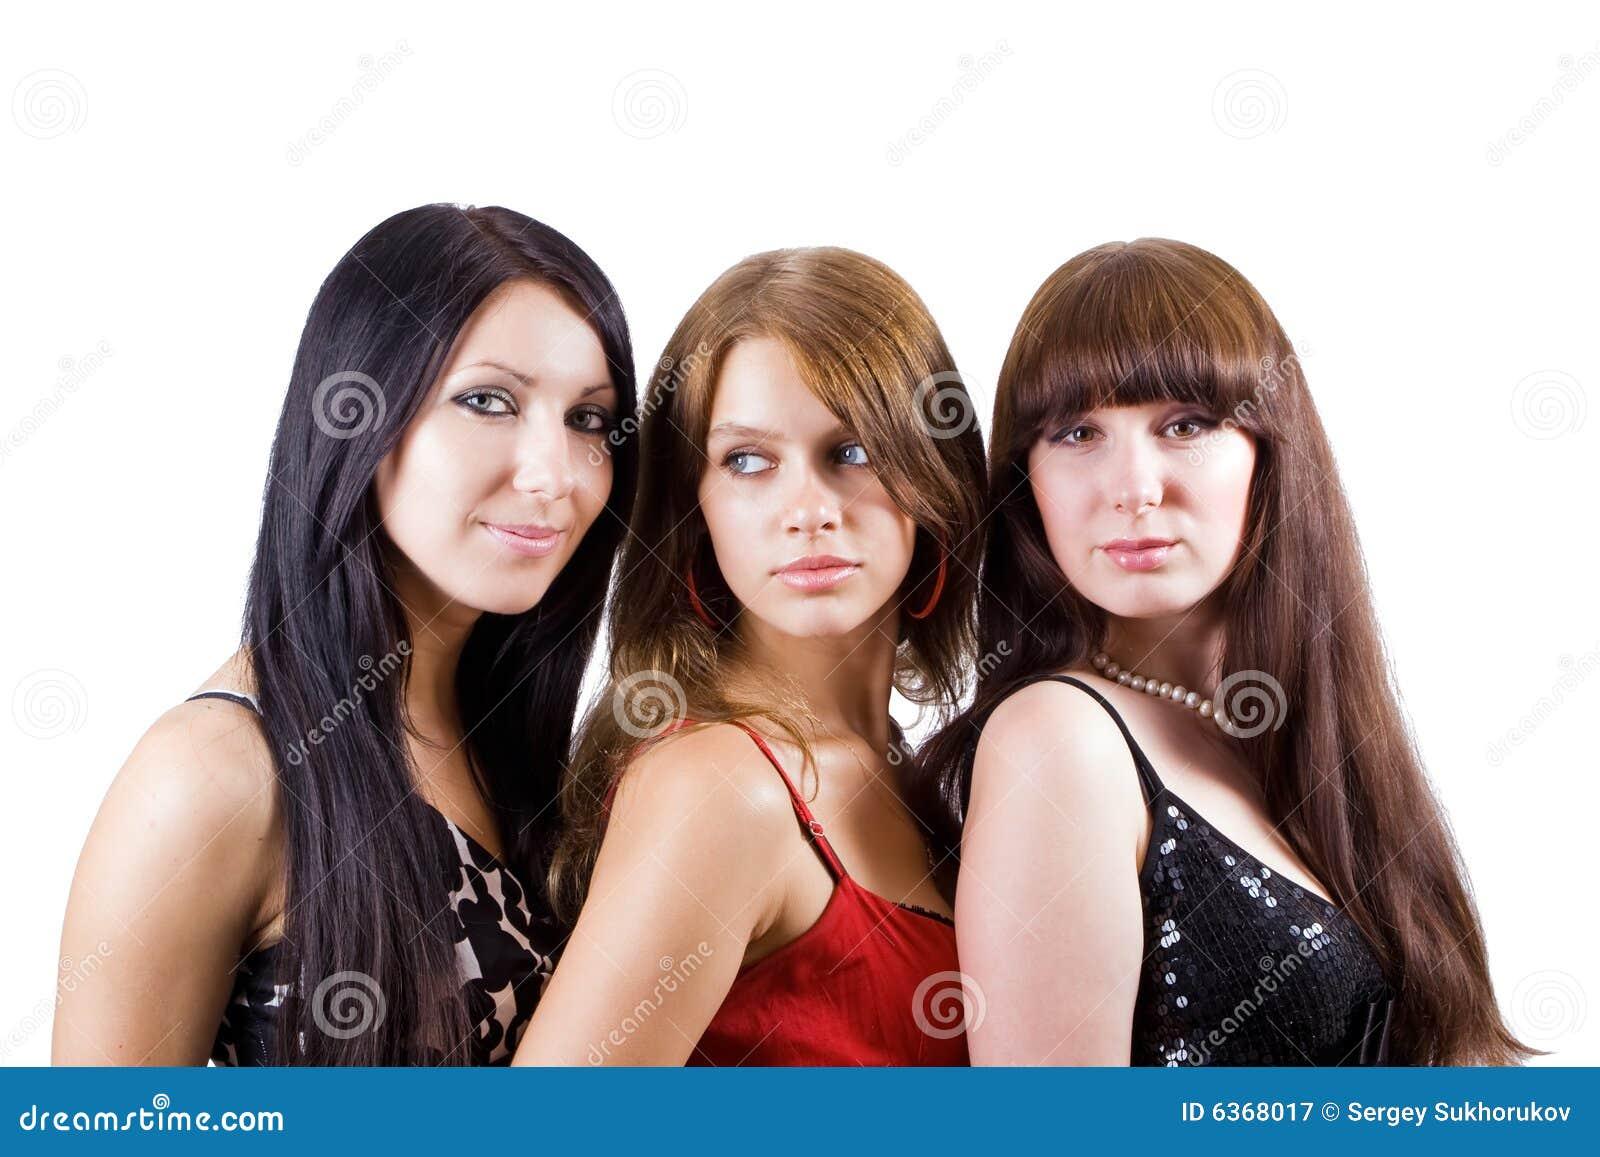 Portrait of three beautiful young women